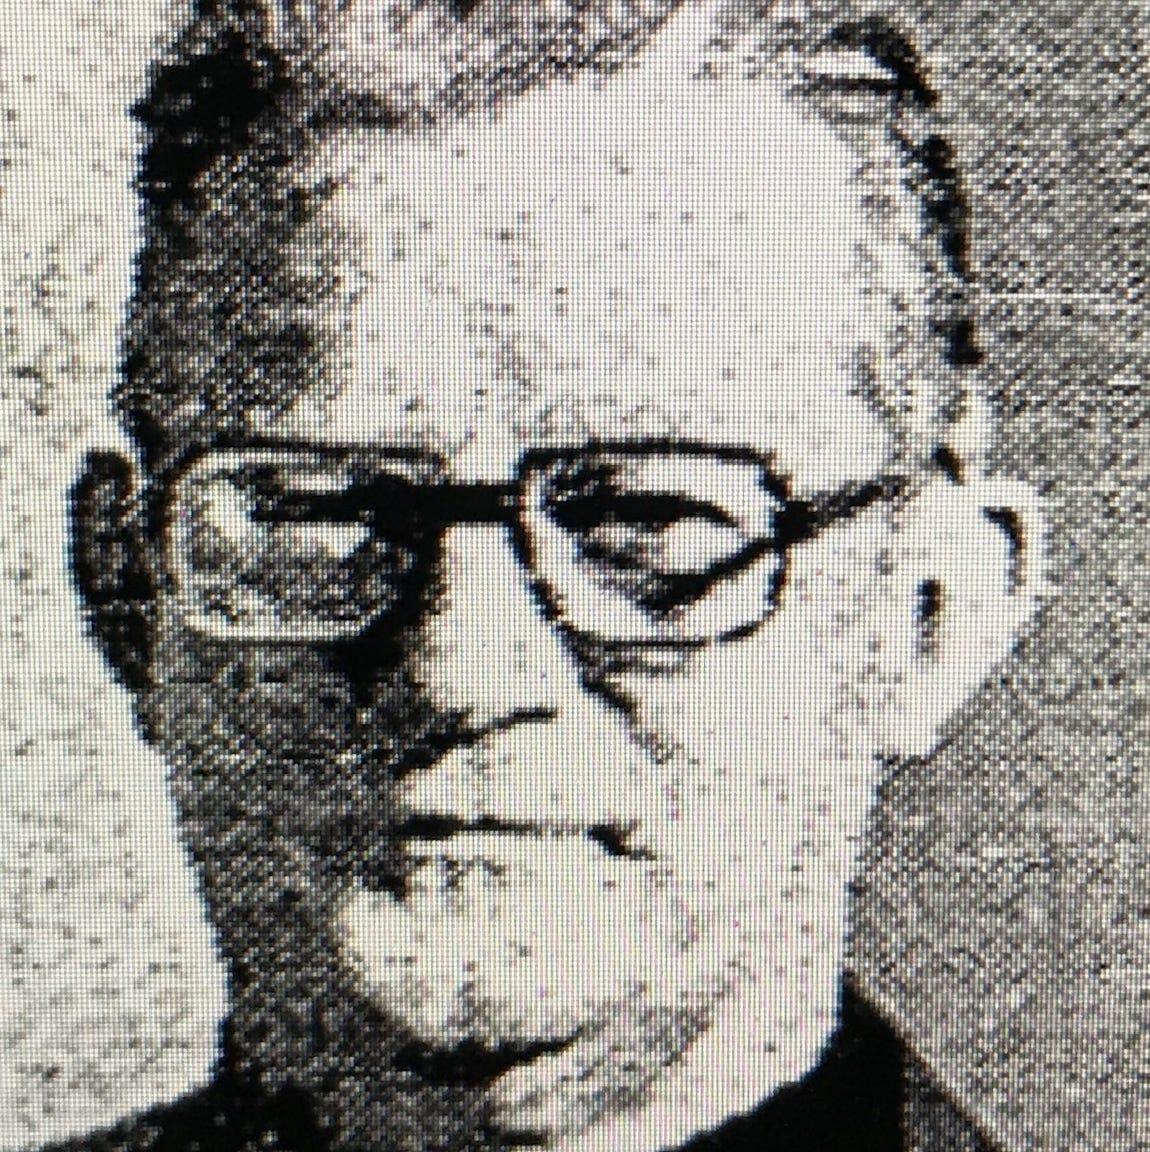 Evansville diocese kept identity of 'incurable pedophile' priest secret in 1990s | Webb